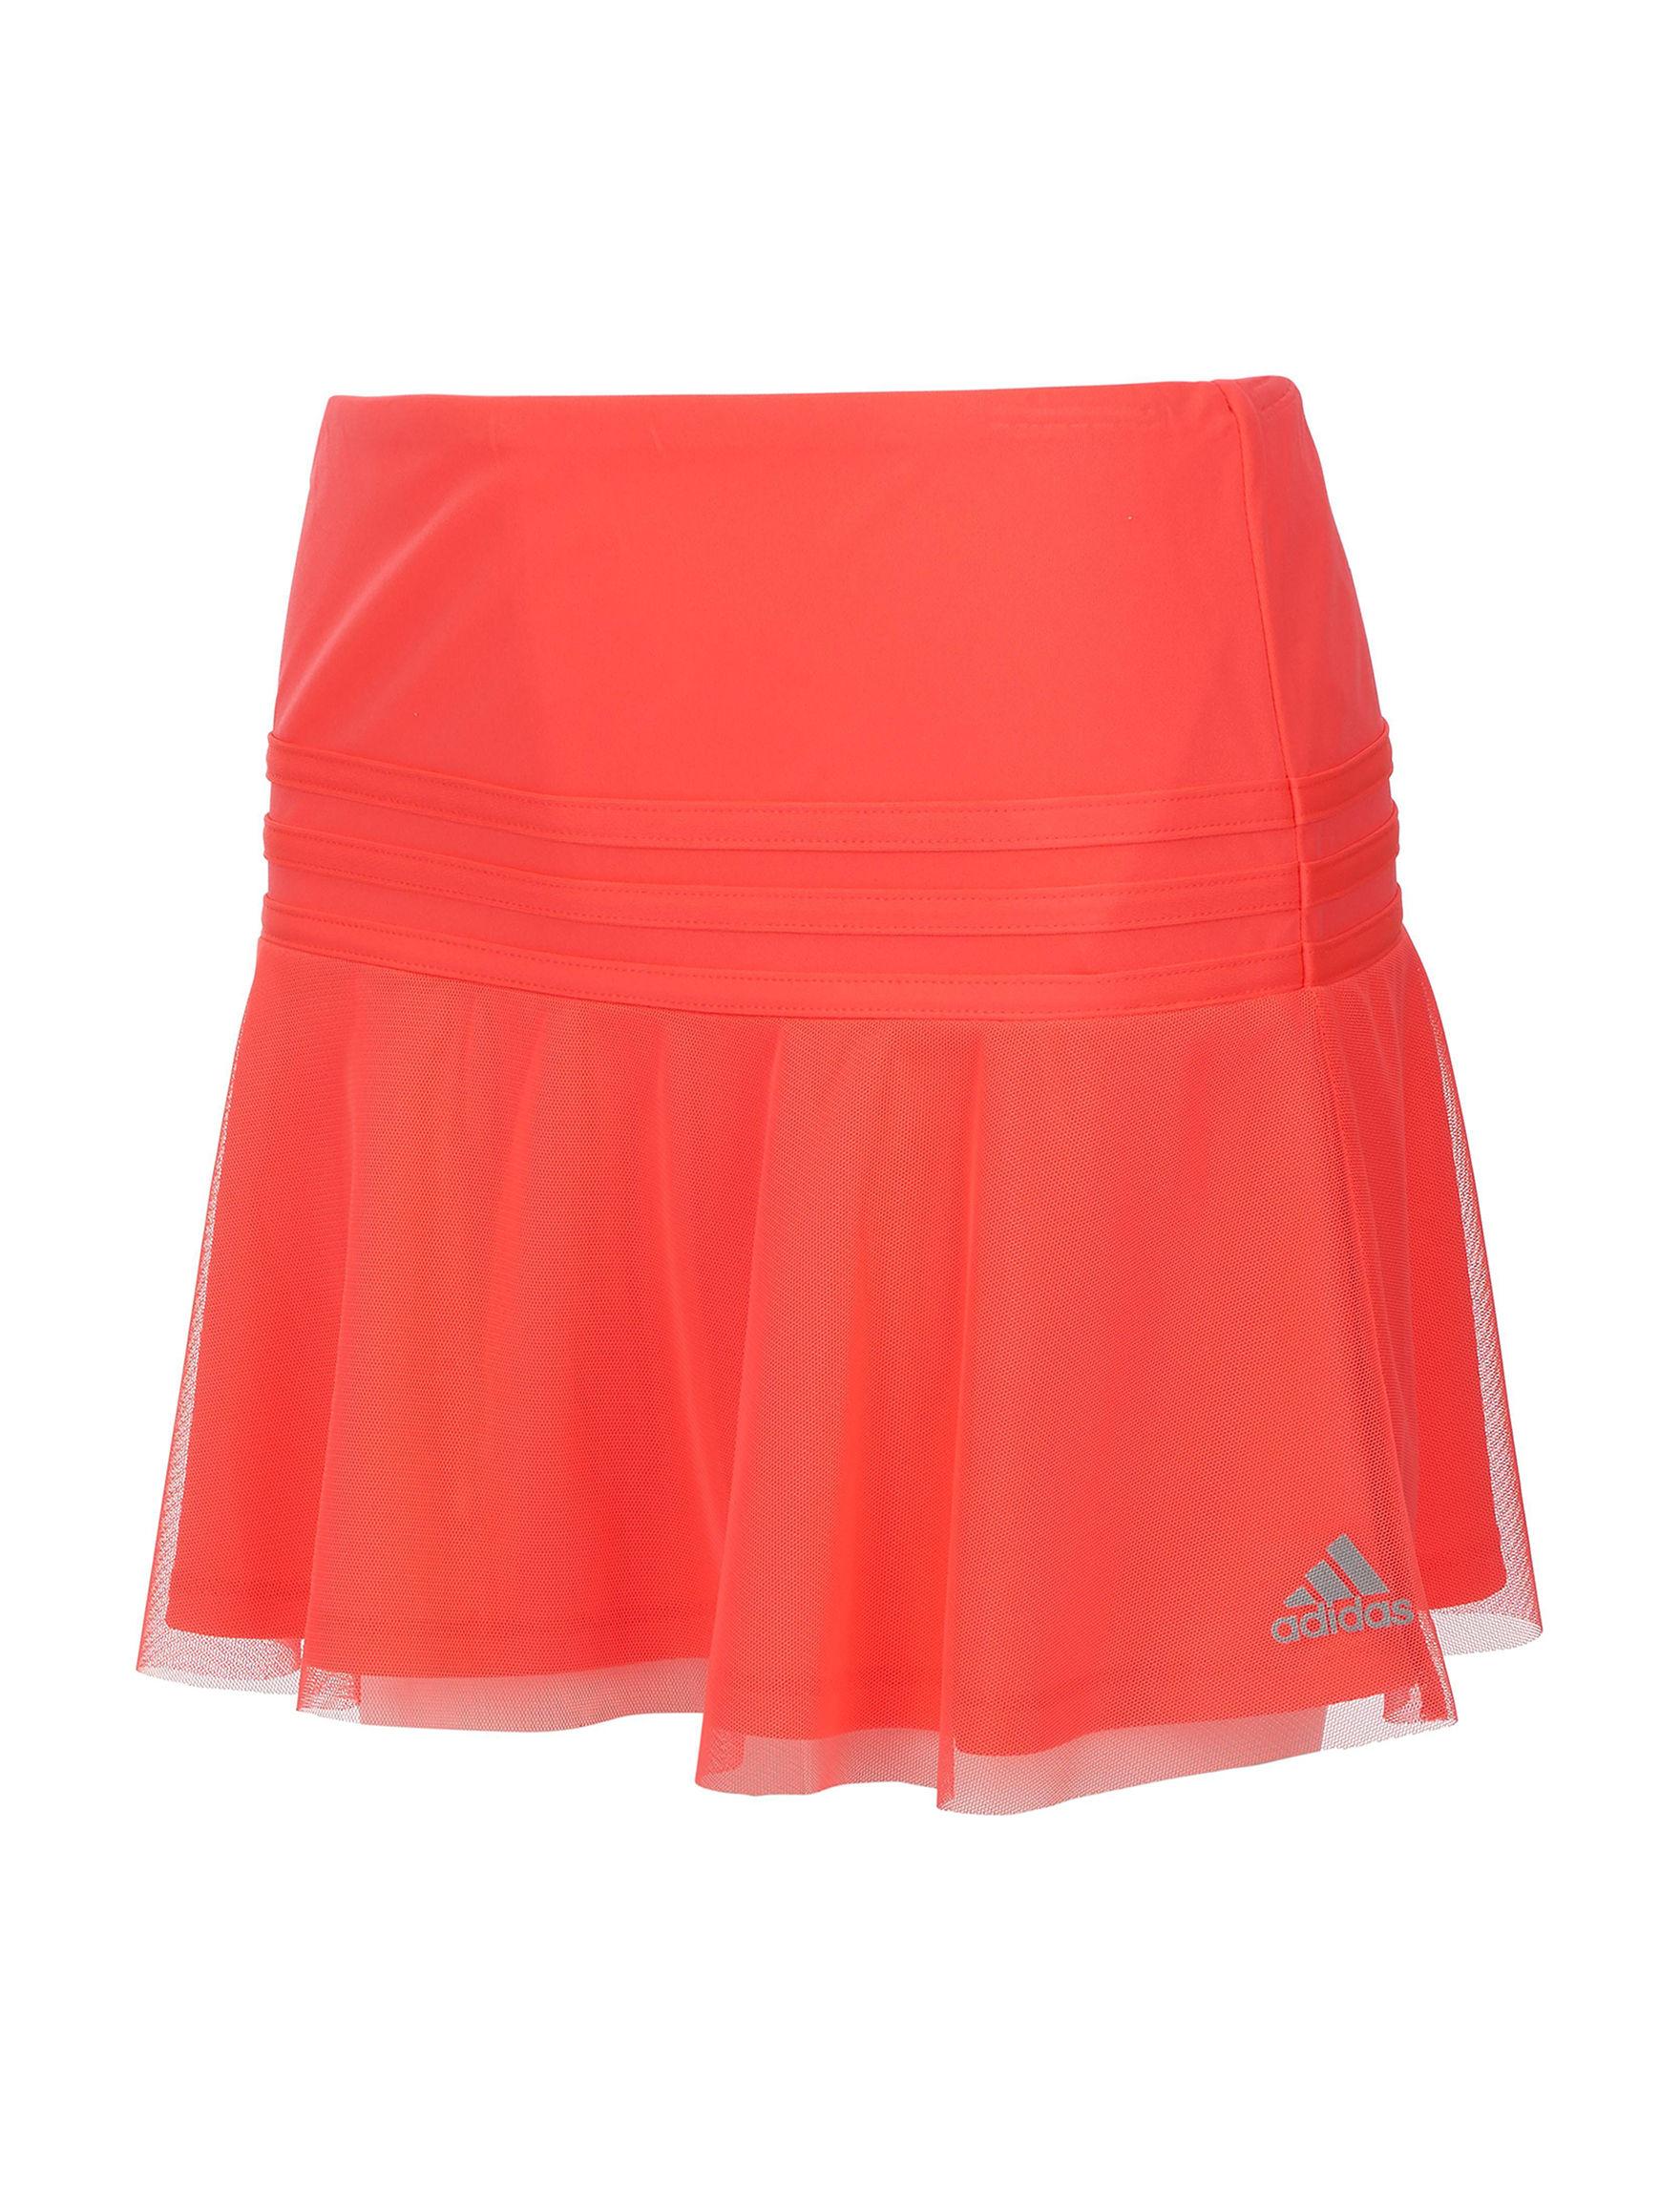 Adidas Bright Red